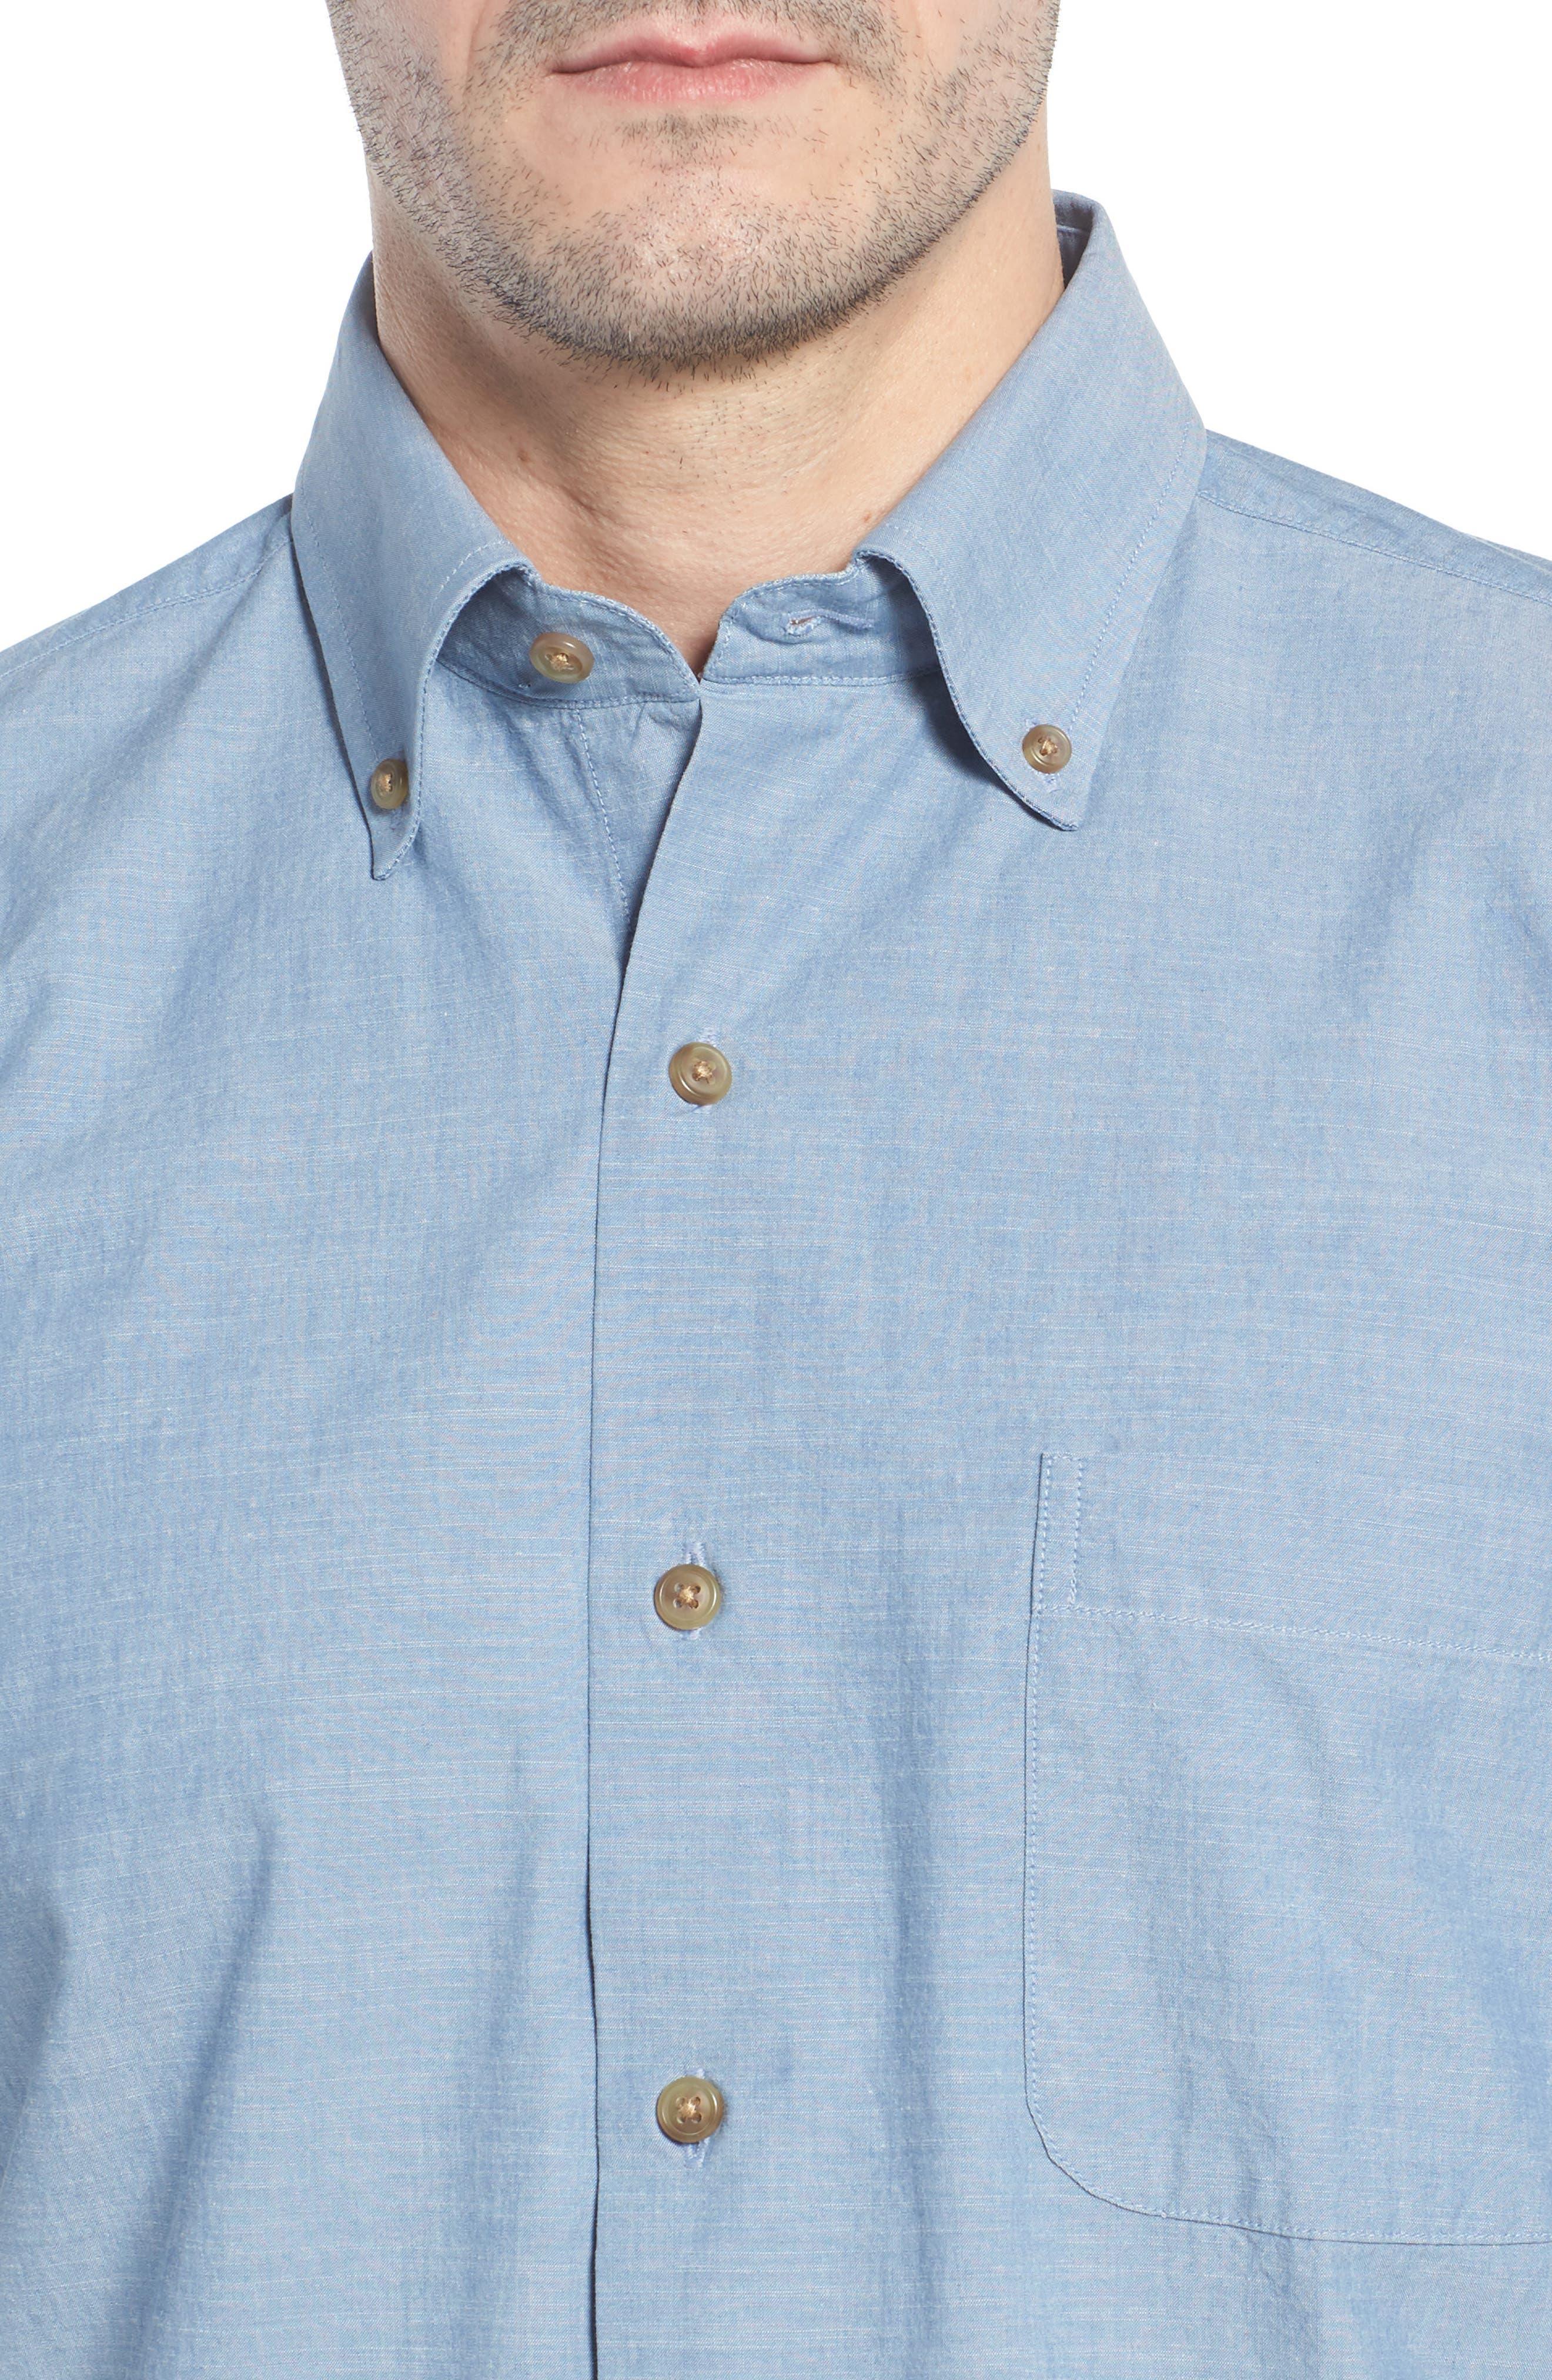 Heritage Chambray Sport Shirt,                             Alternate thumbnail 4, color,                             TAR HEEL BLUE